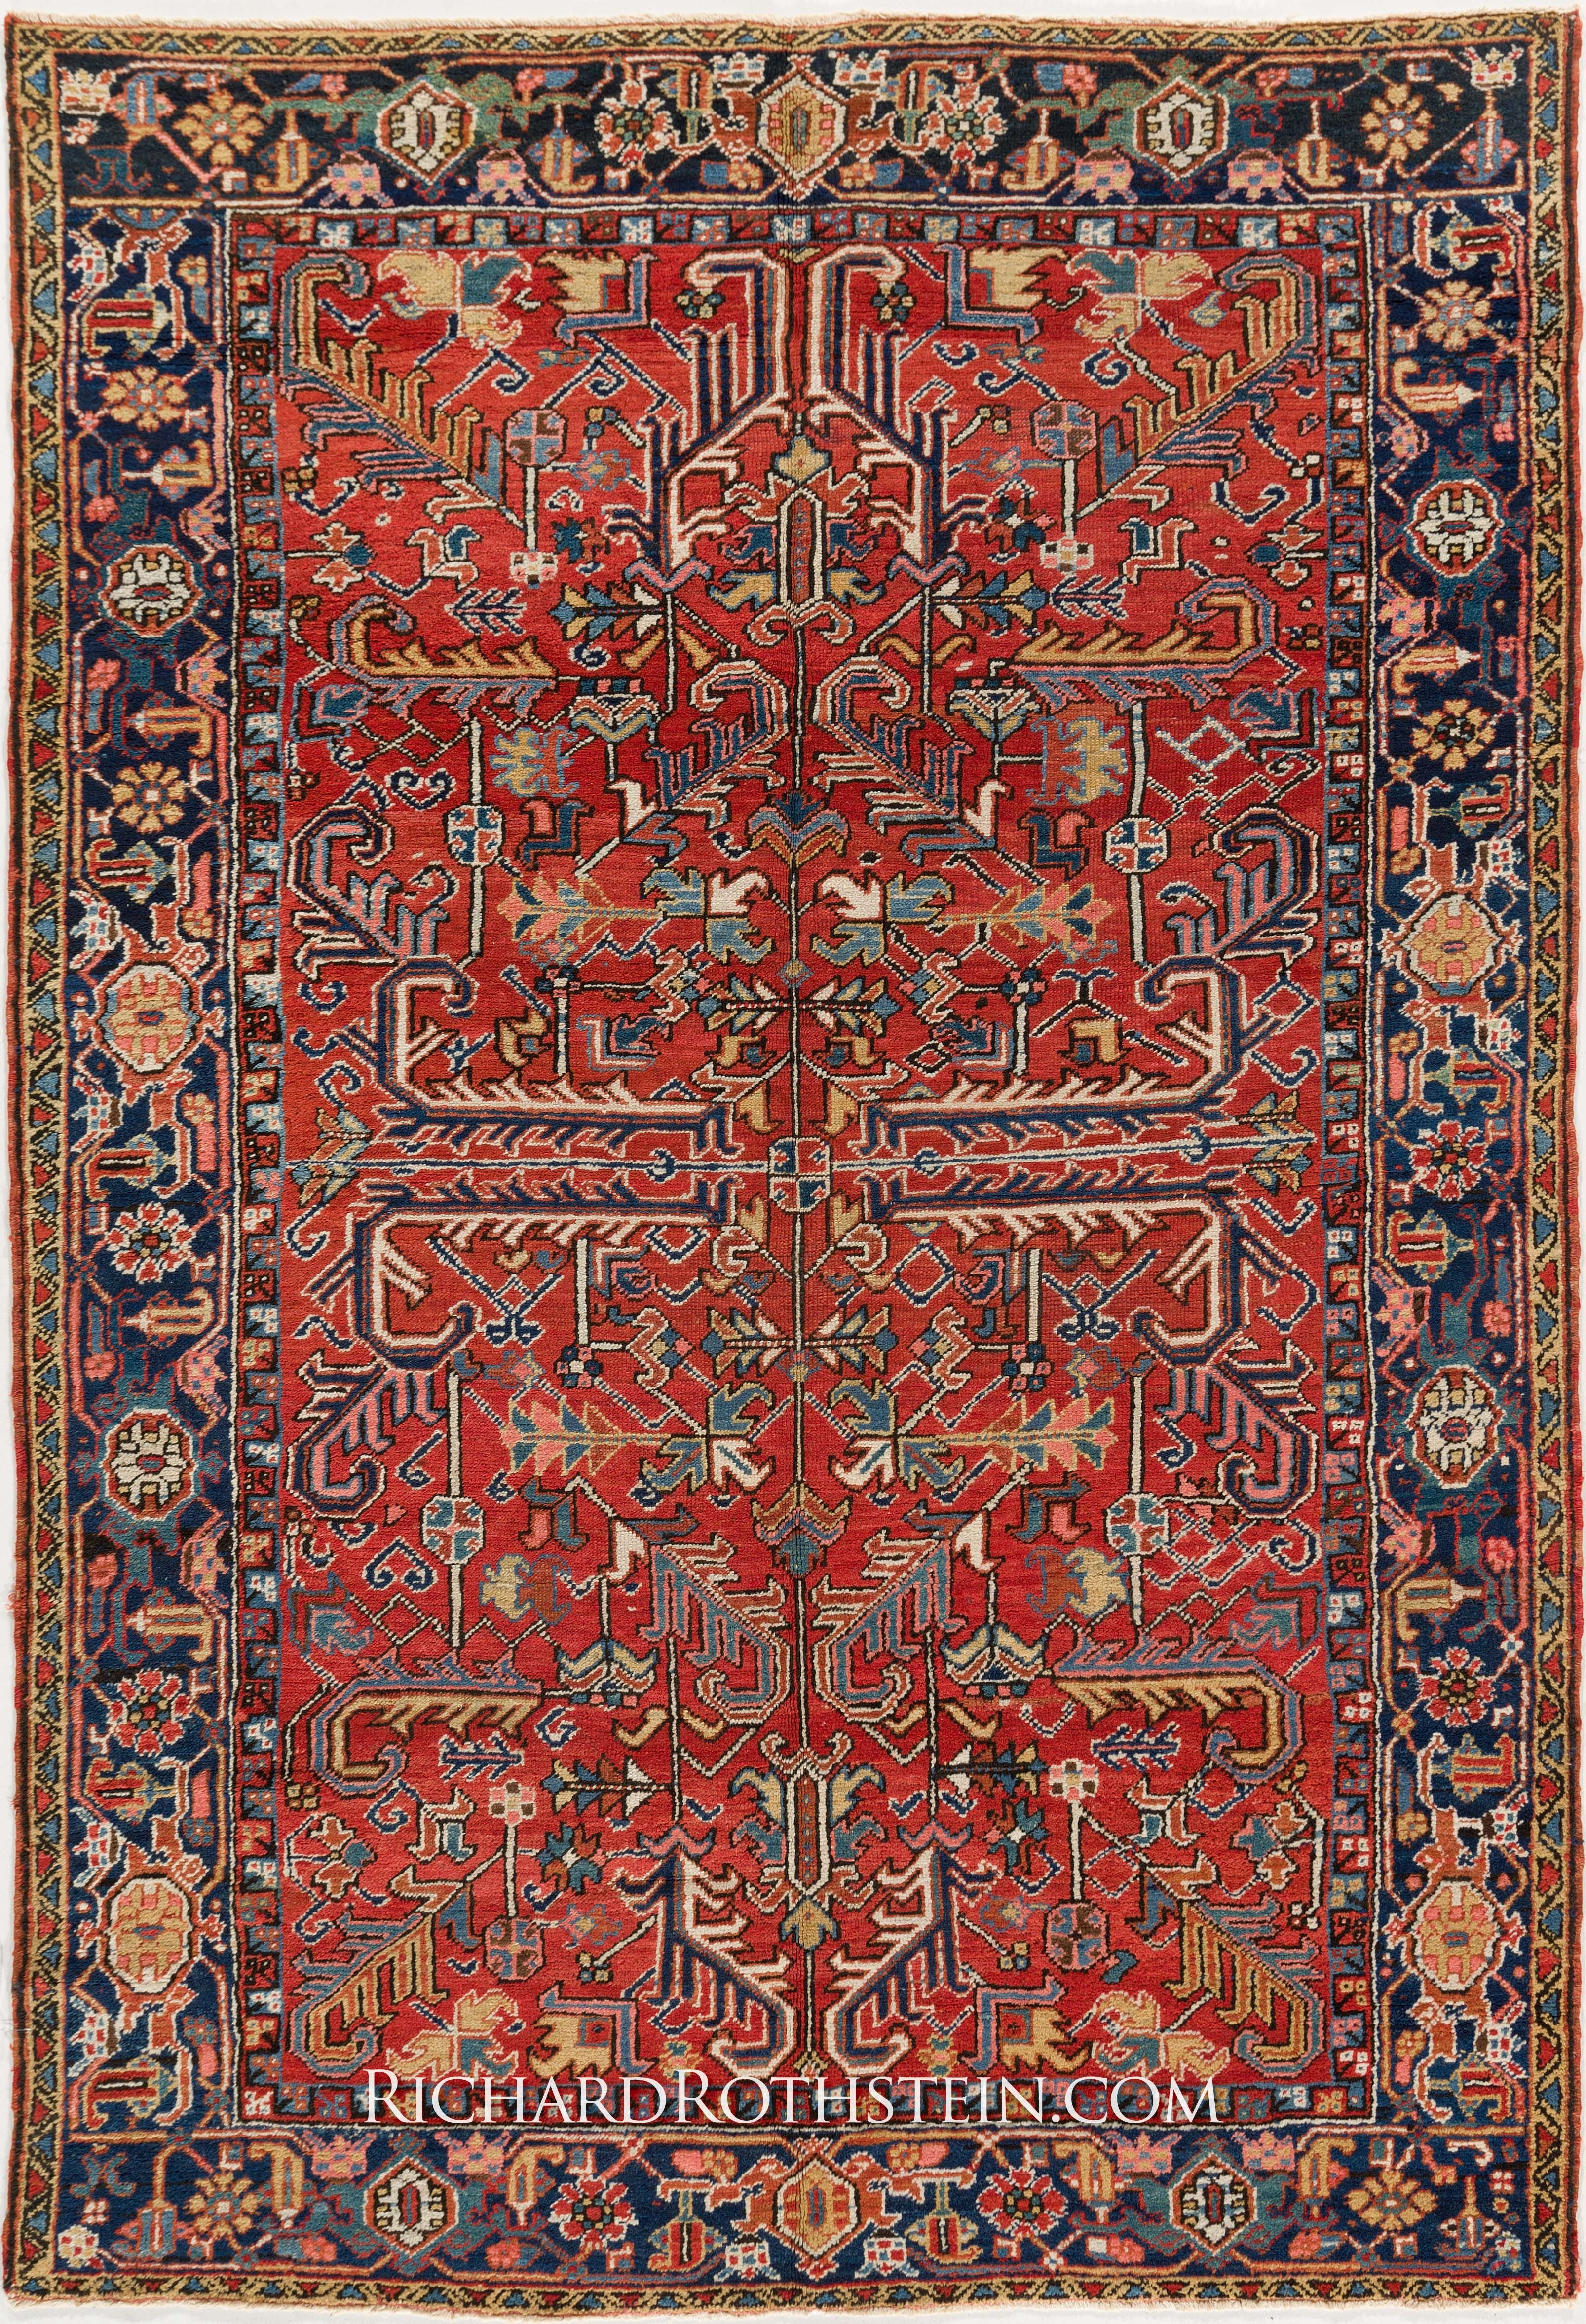 Antique Heriz Oriental Rug Size 6